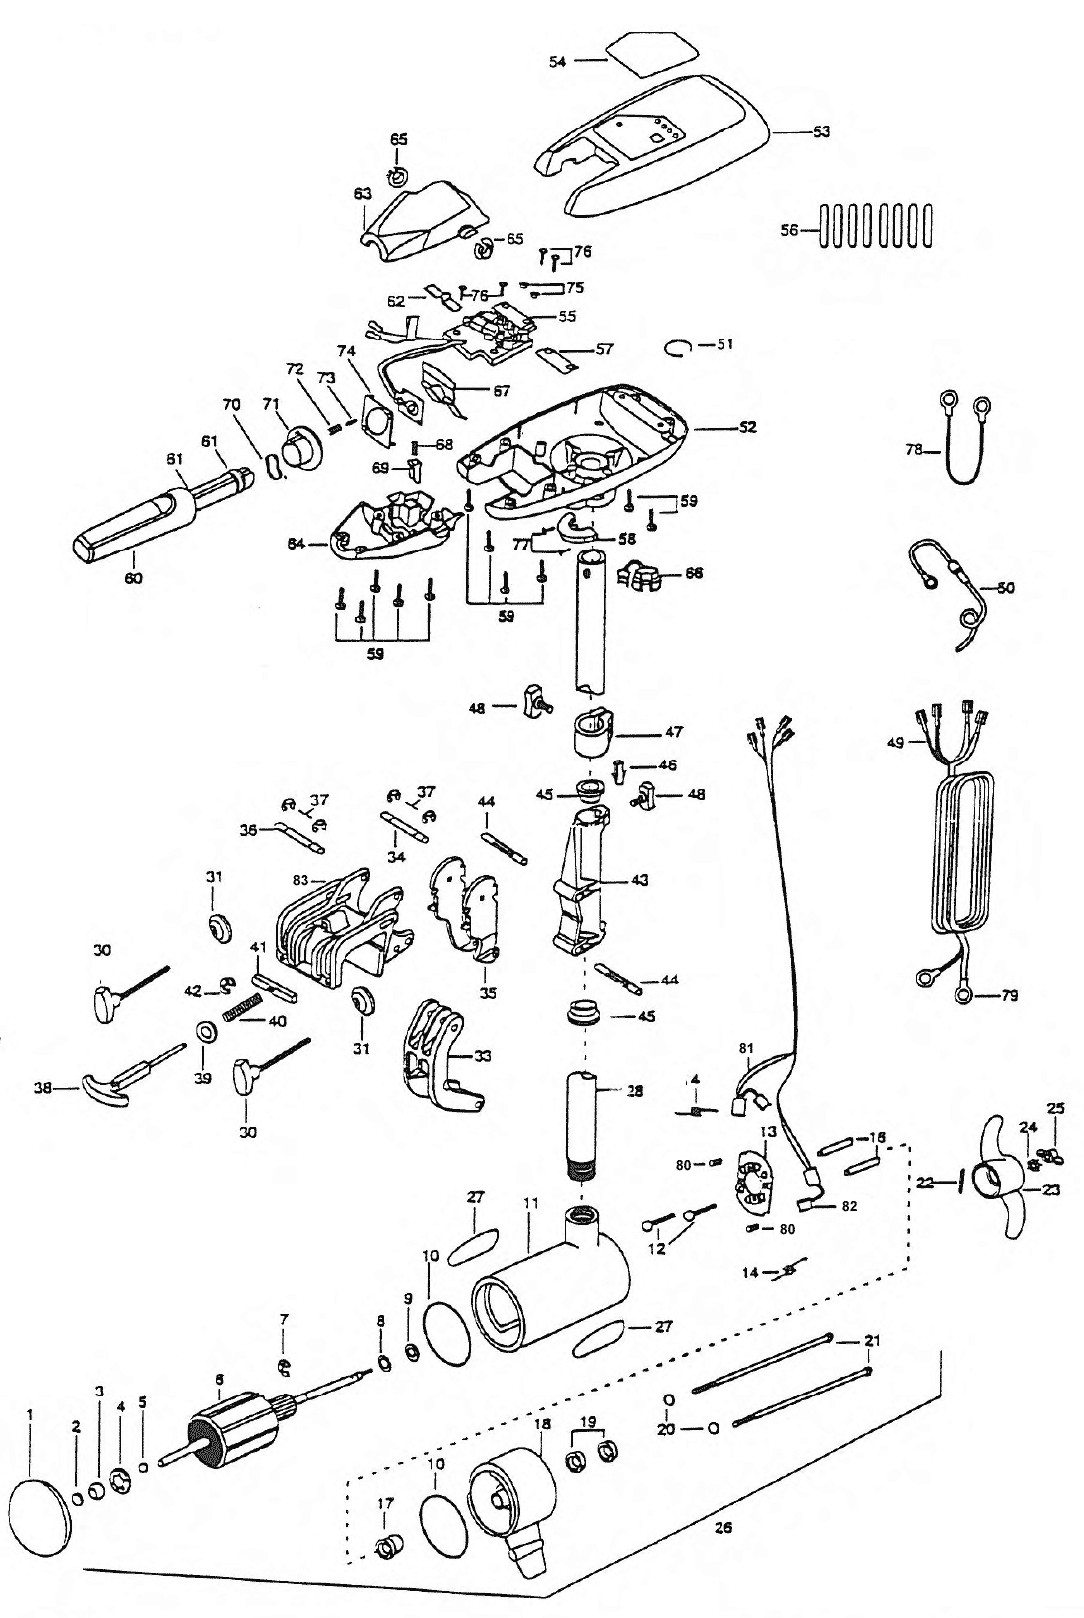 minn kota riptide 55 wiring diagram 1986 toyota pickup copilot best library terrova rh 27 kandelhof restaurant de fortrex 80